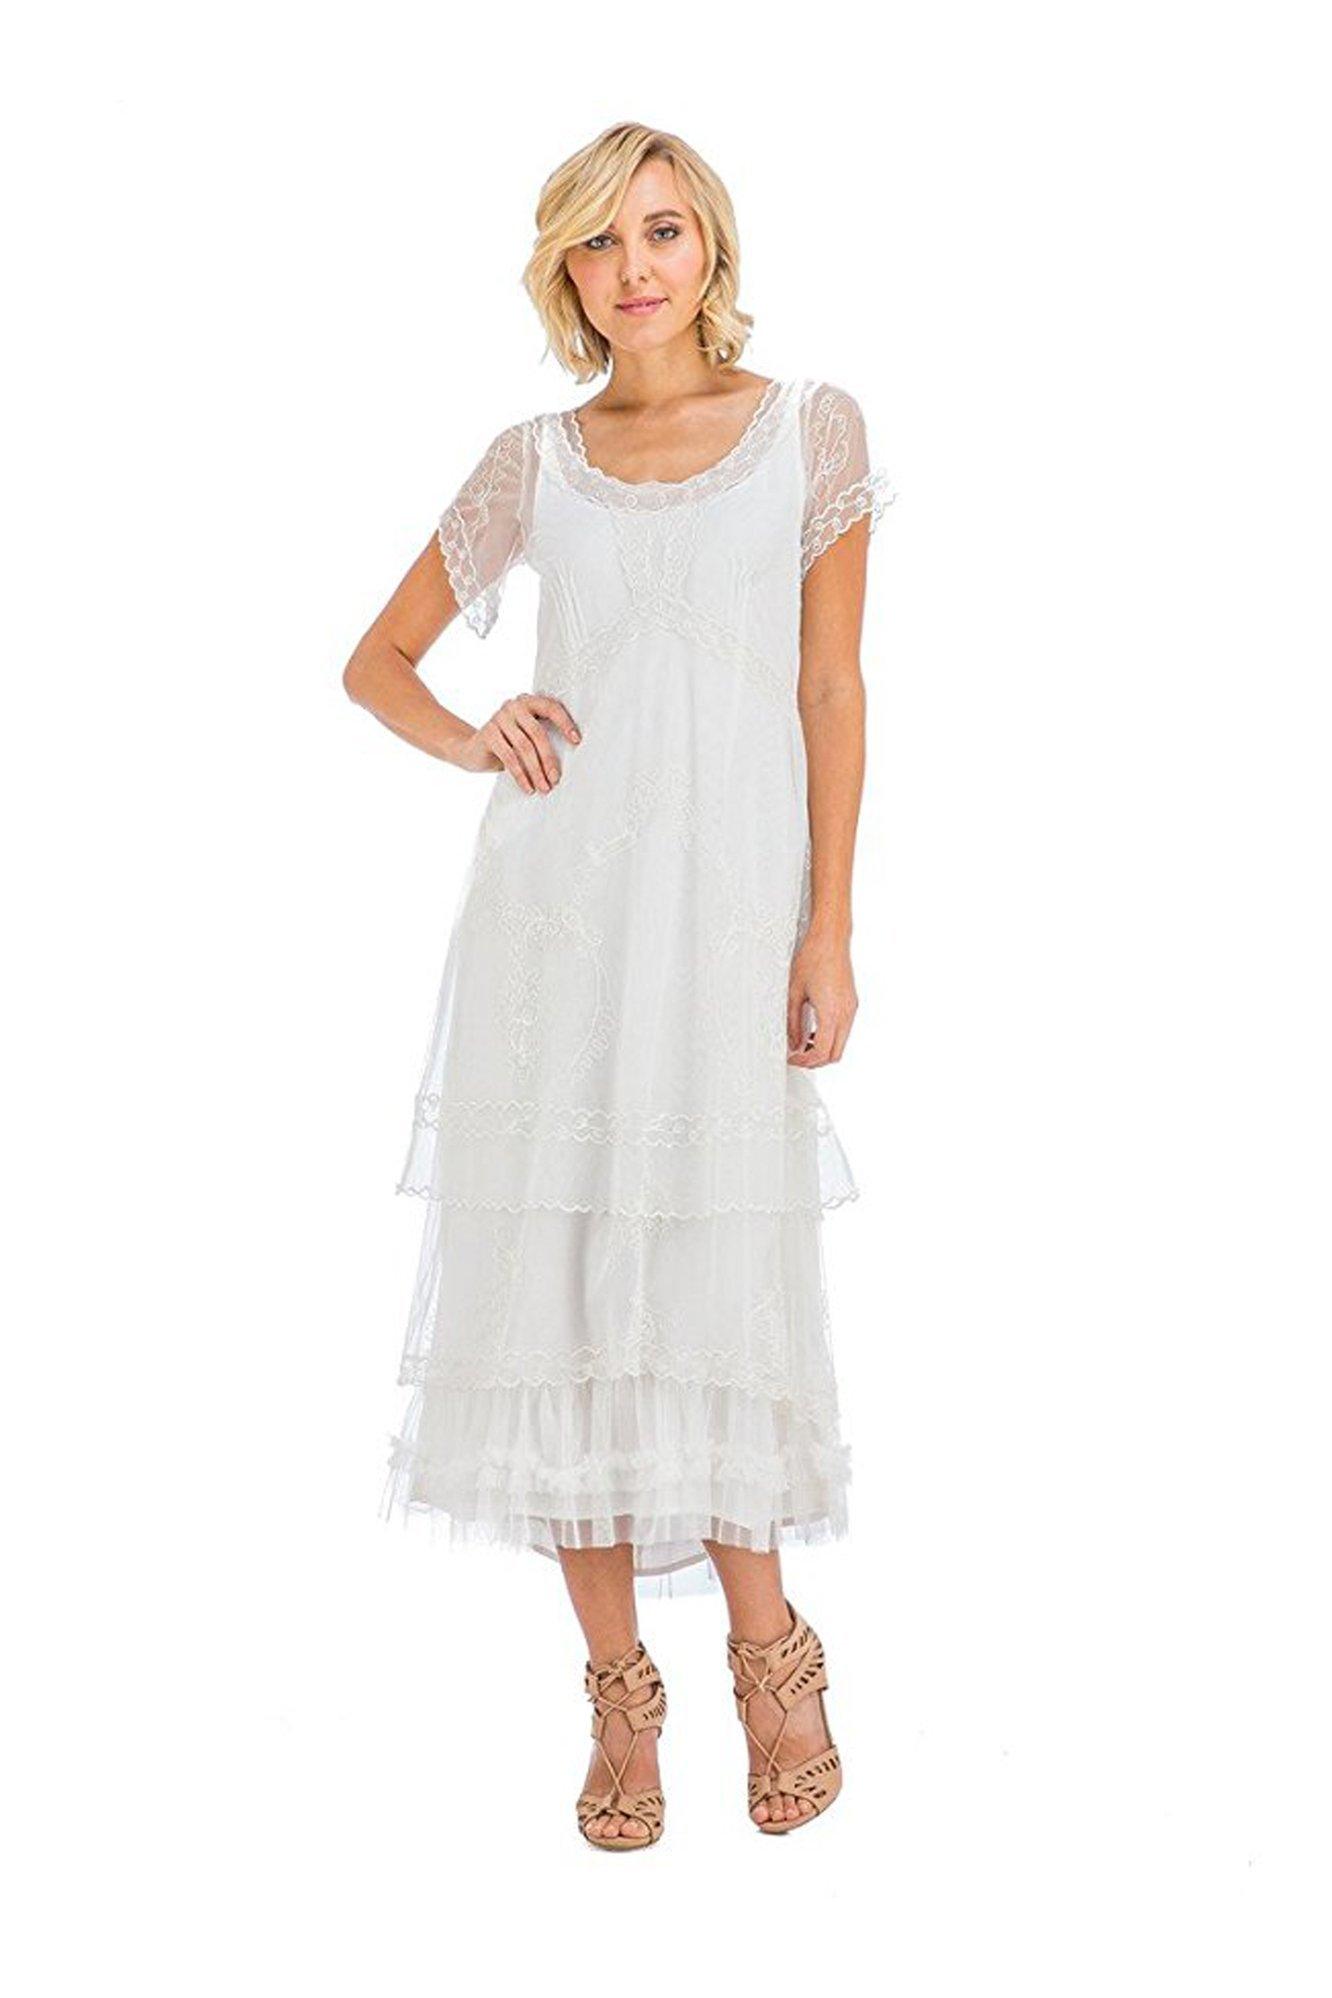 Antique cream wedding dress  Nataya CL Arrianna Vintage Style Wedding Dress in Ivory  Maybe